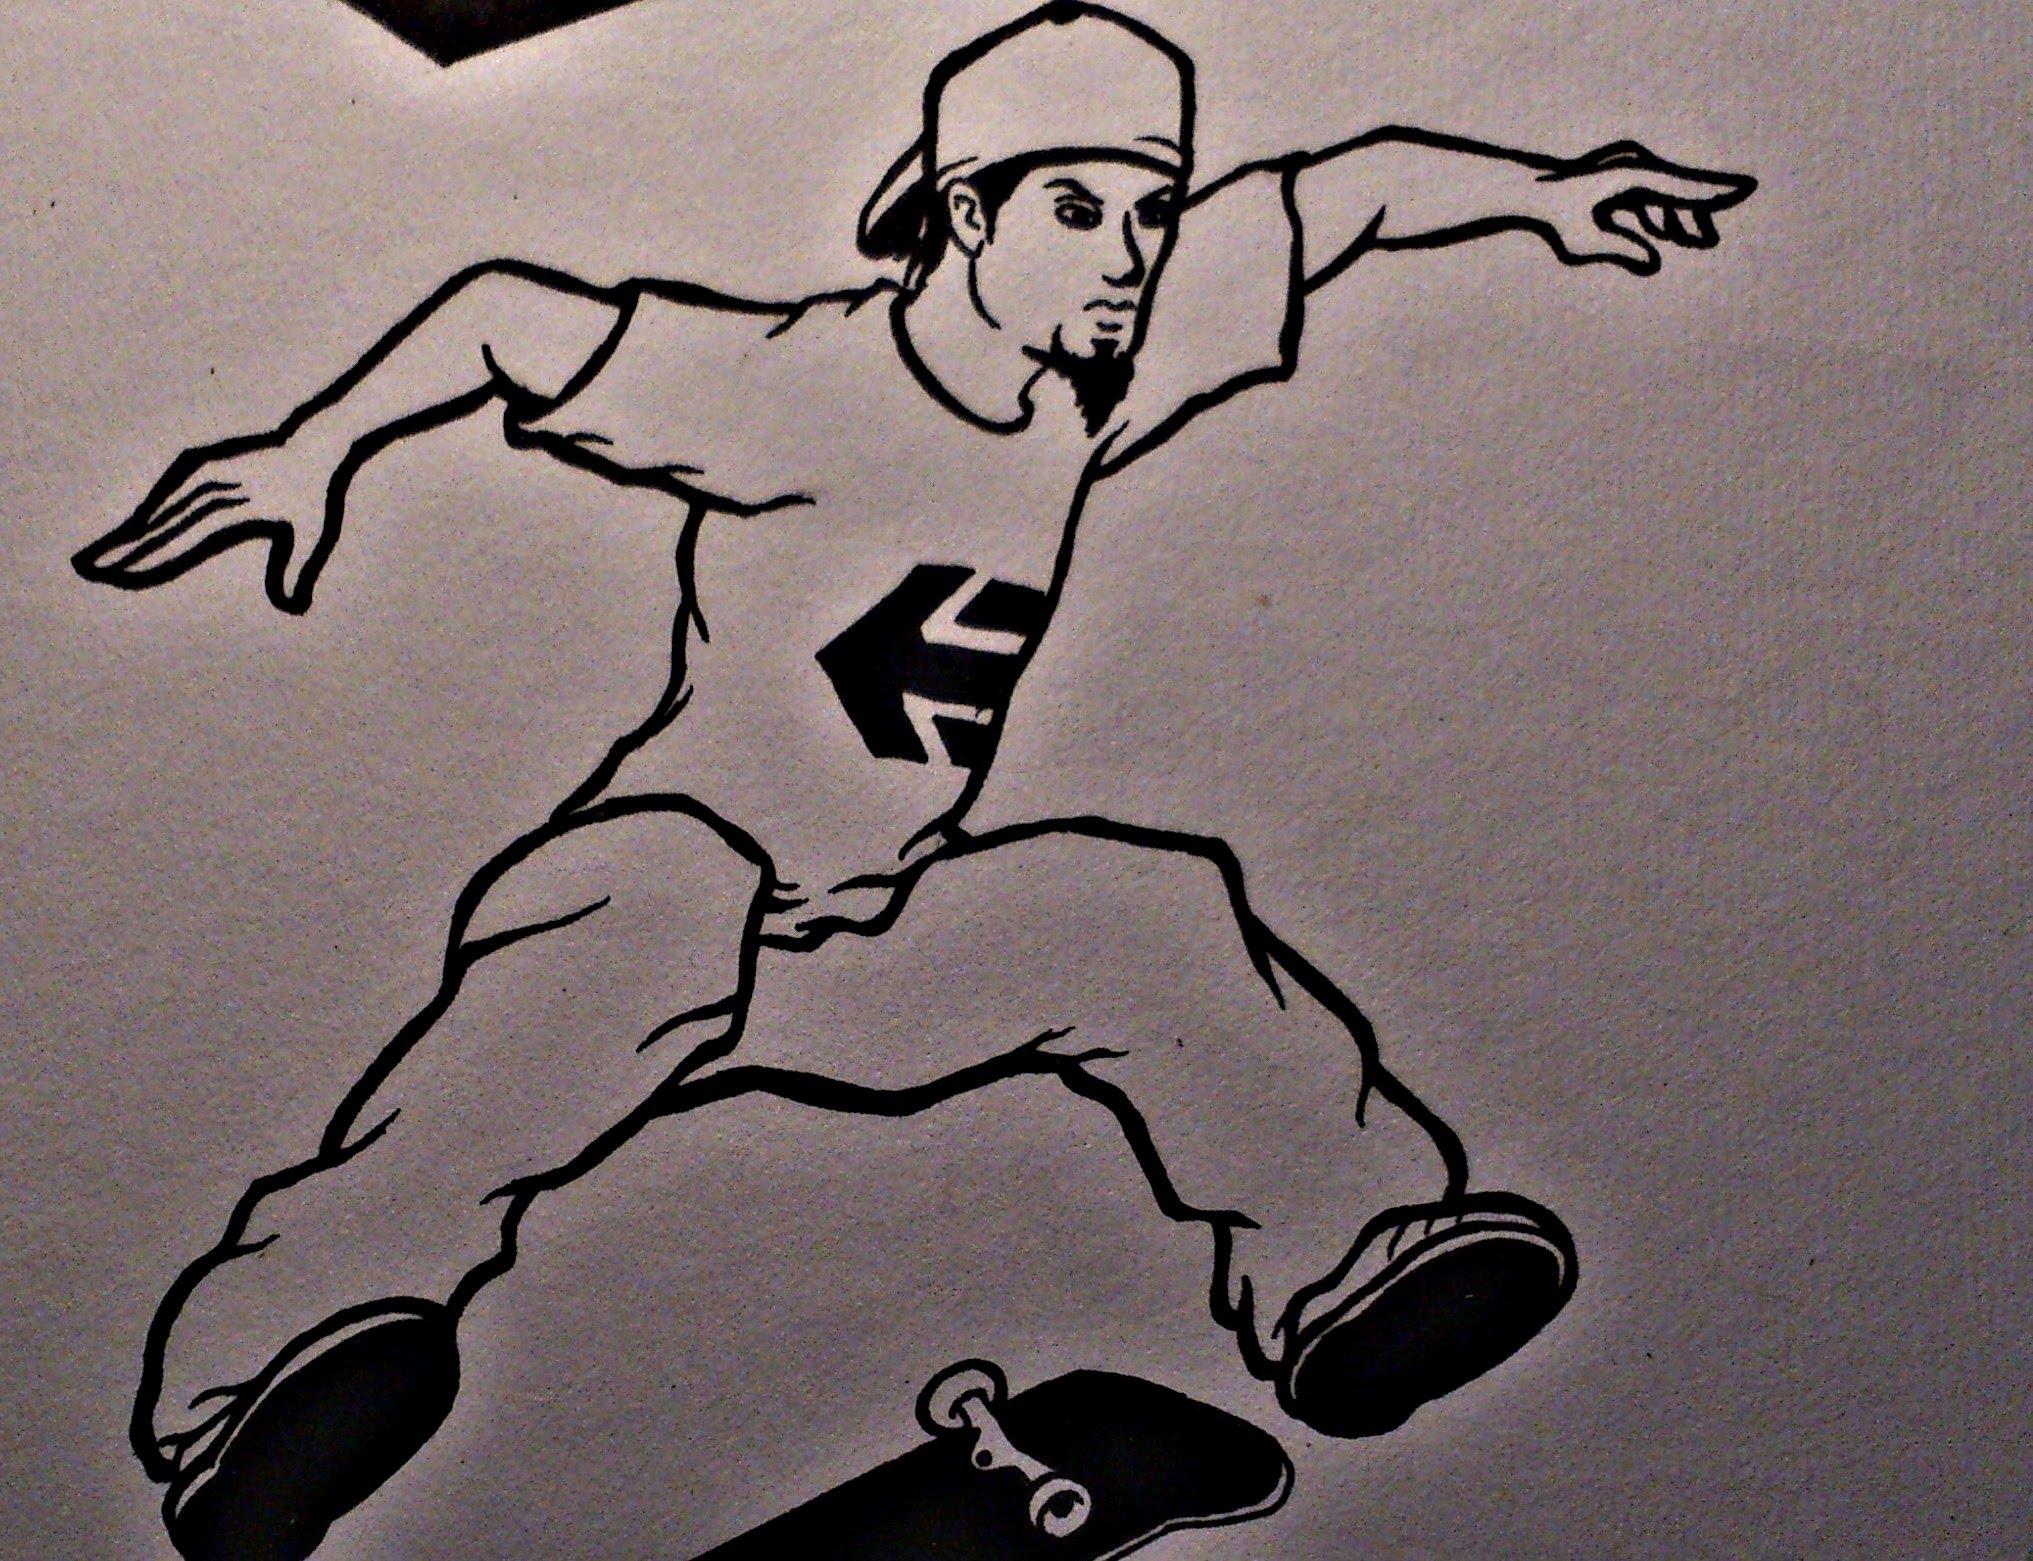 Drawn skateboard guy How a a to Skater